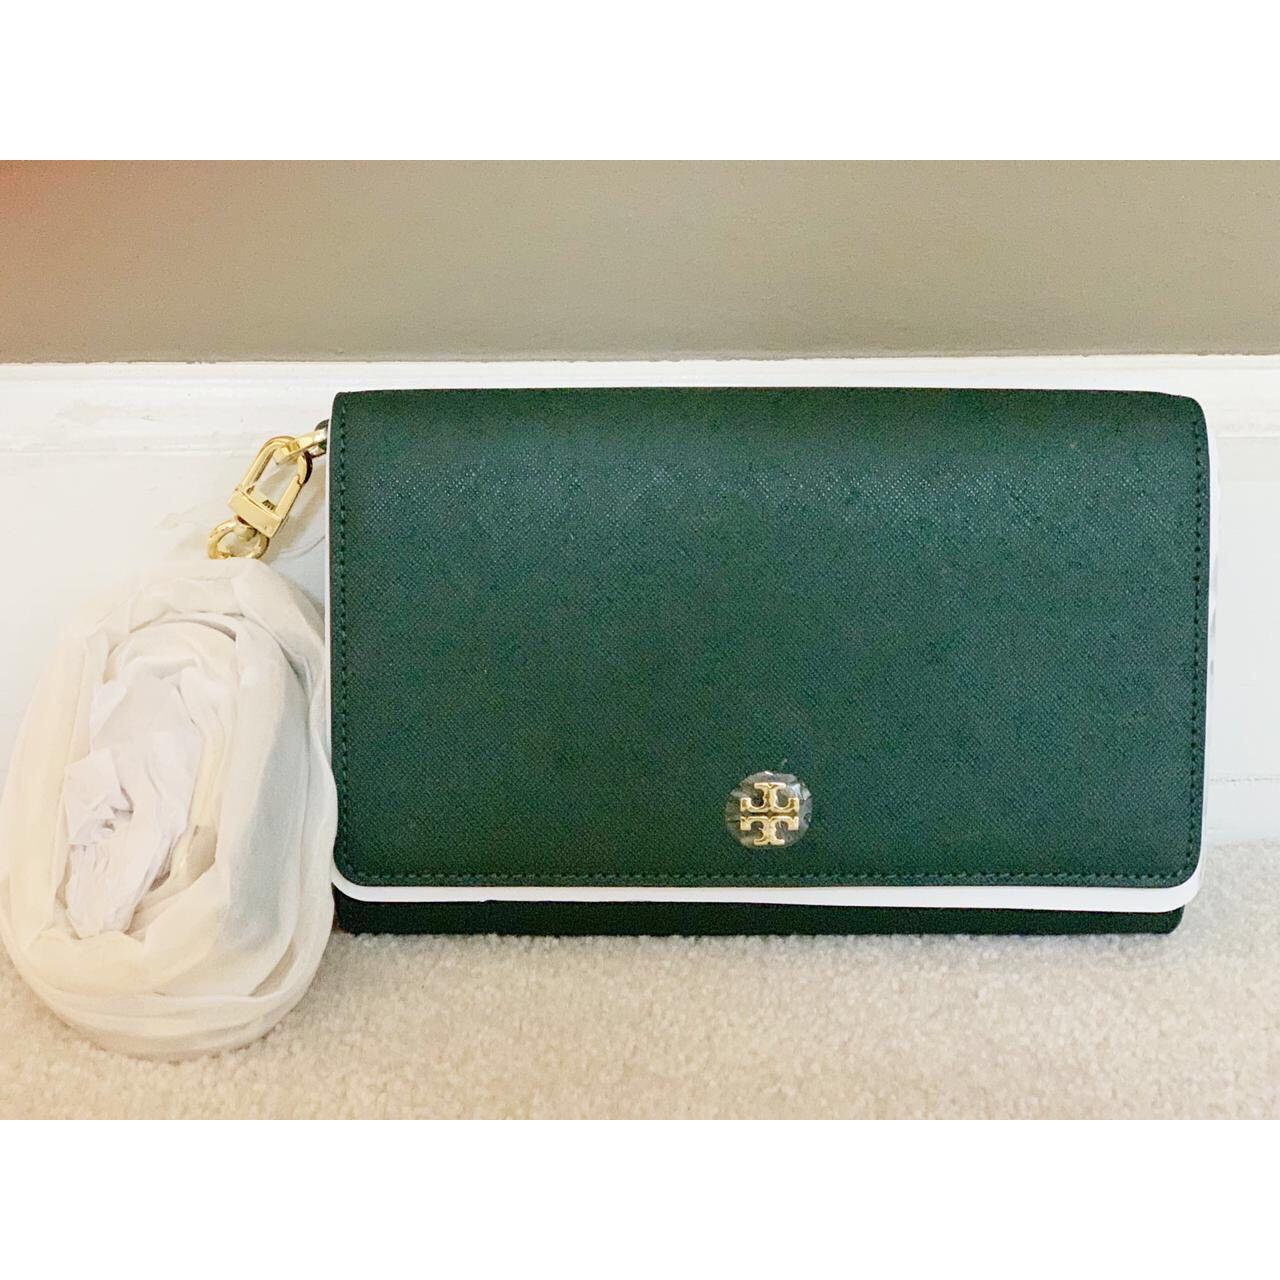 f2af7bd4f5bc7 Home · Women s Fashion · Bags   Wallets · Handbags. photo photo photo